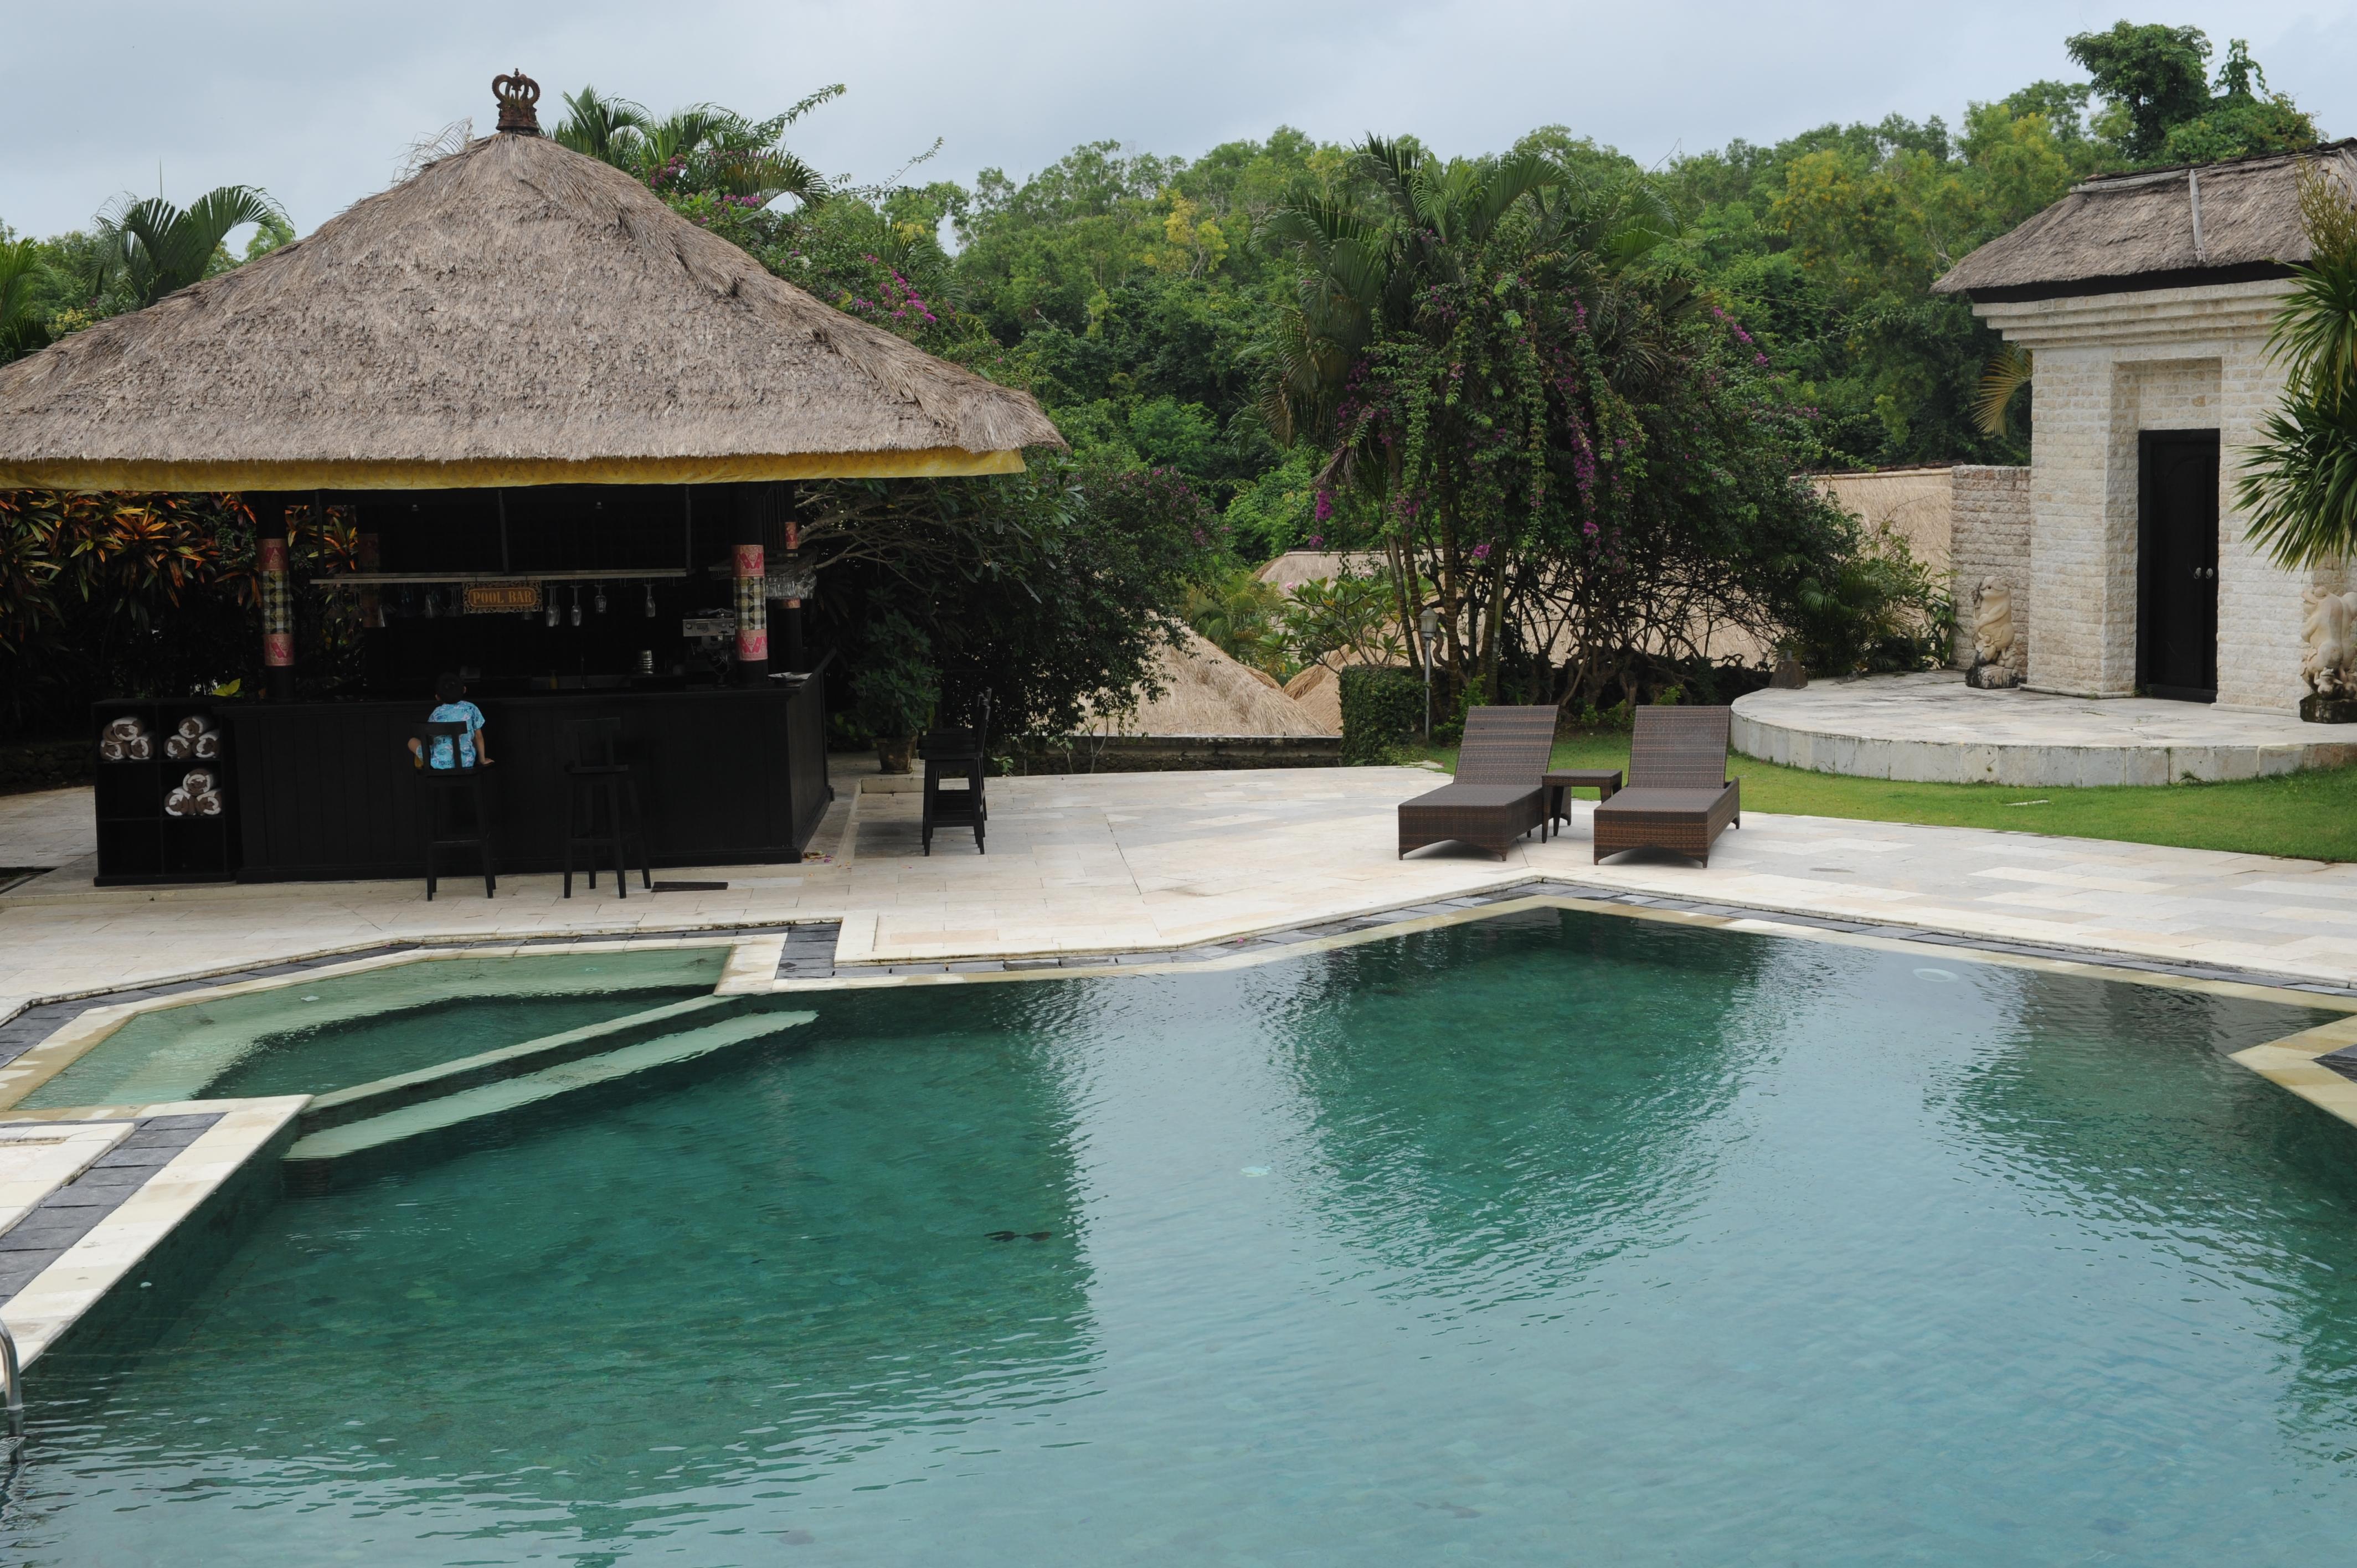 bali(巴厘岛梦境别墅